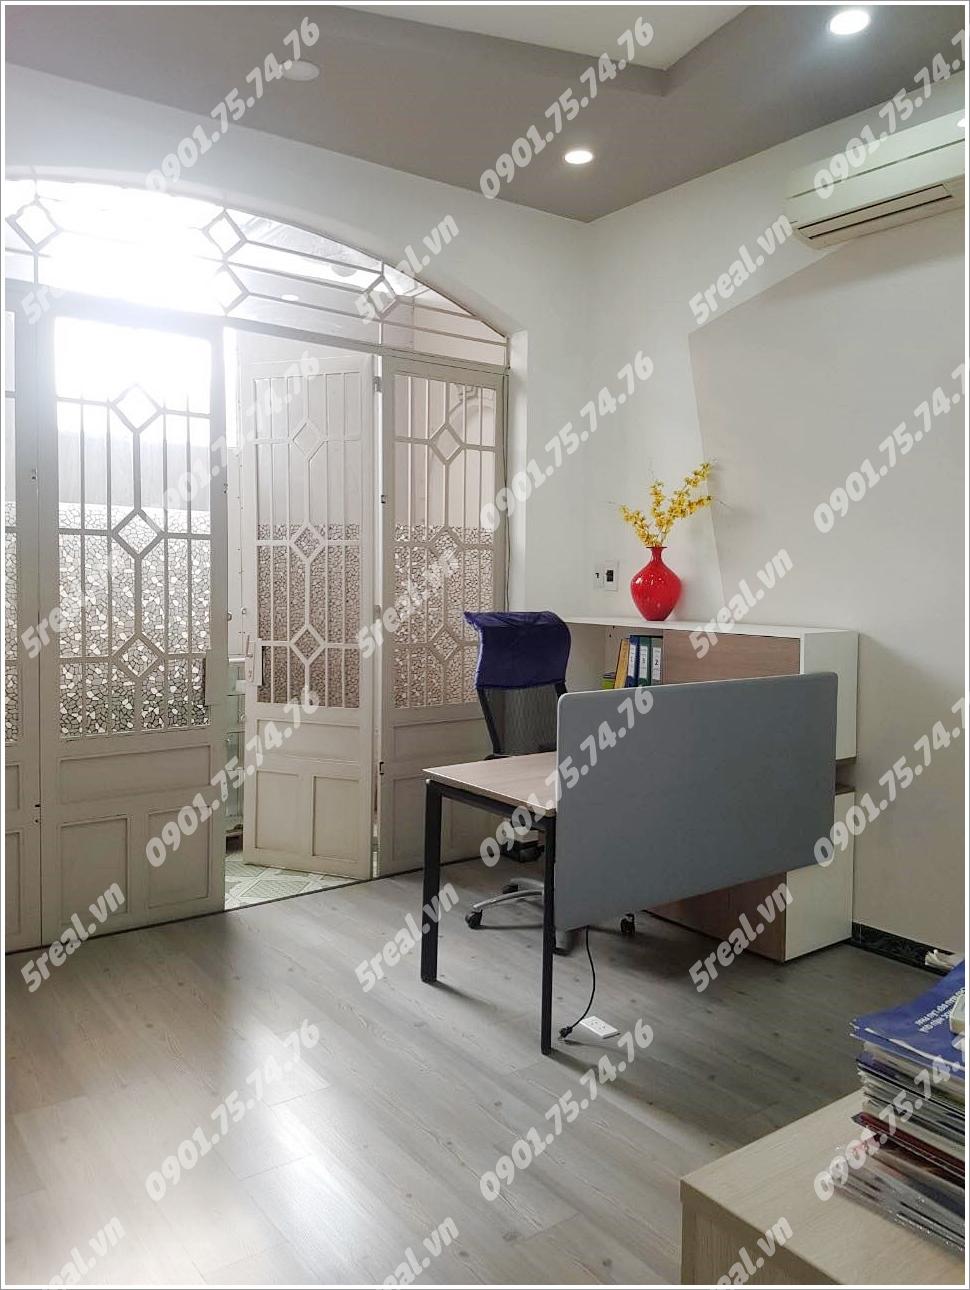 doo-building-nguyen-van-qua-quan-12-van-phong-cho-thue-5real.vn-04